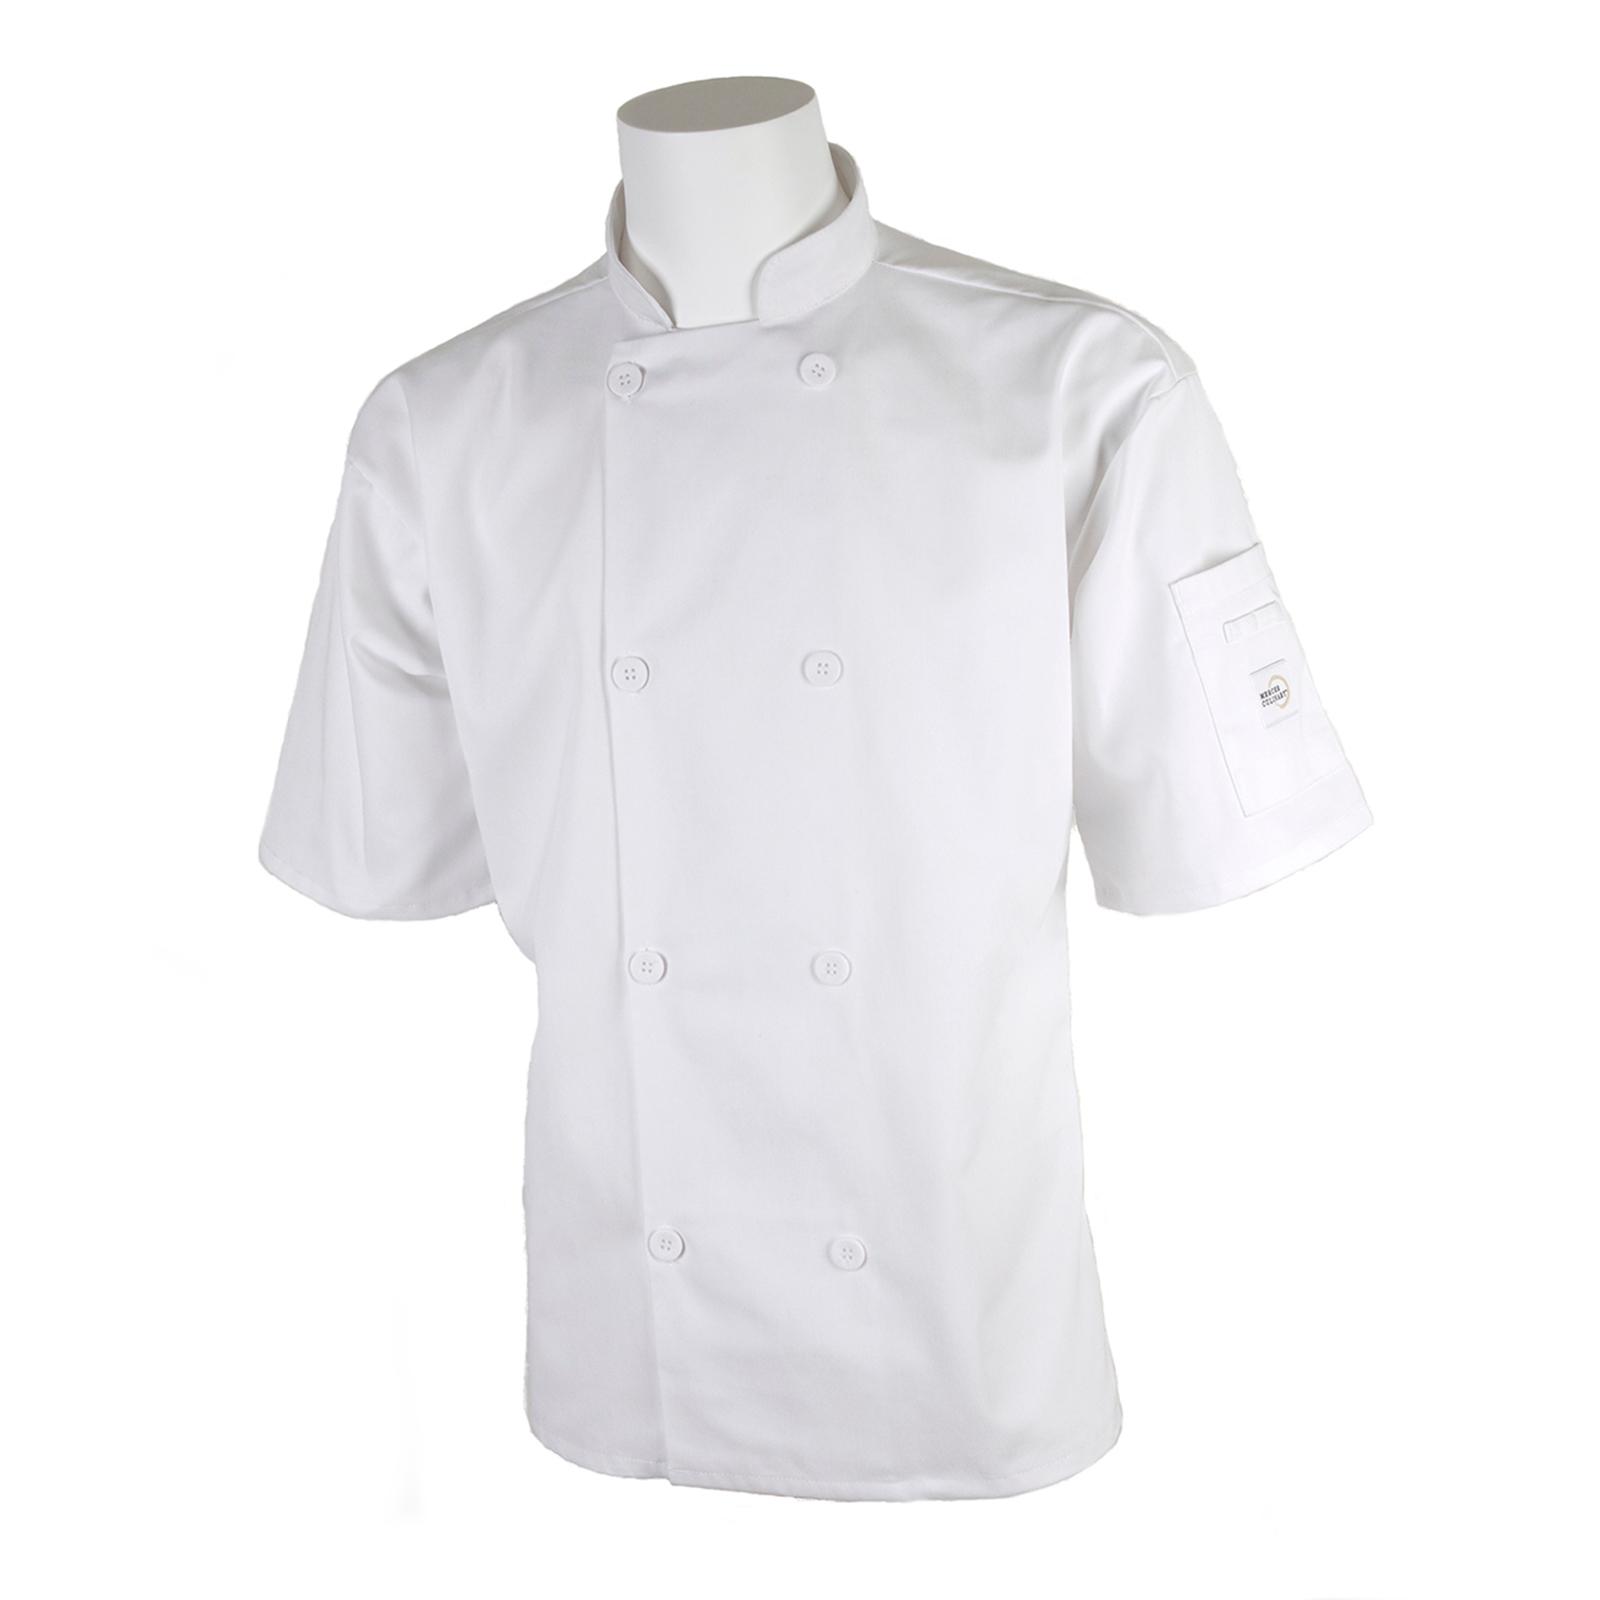 Mercer Culinary M60013WH4X chef's coat